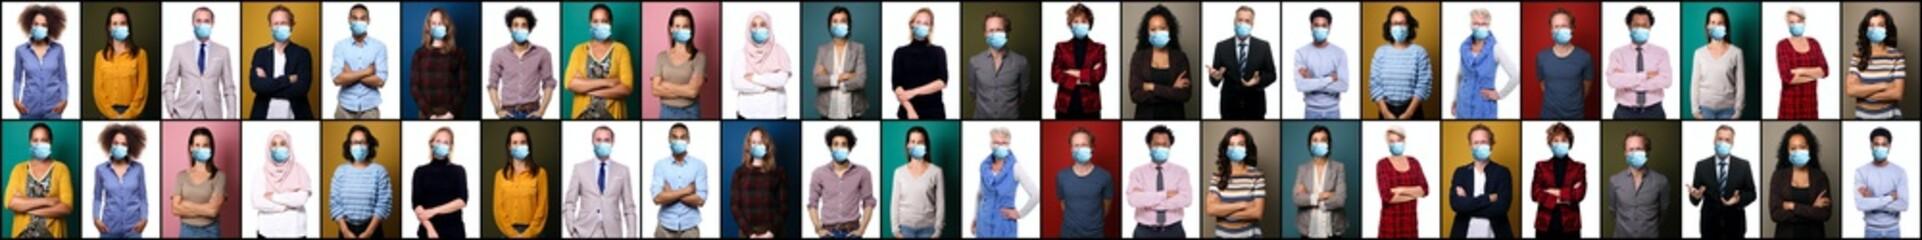 Beautiful of 19 people wearing a mouth mask